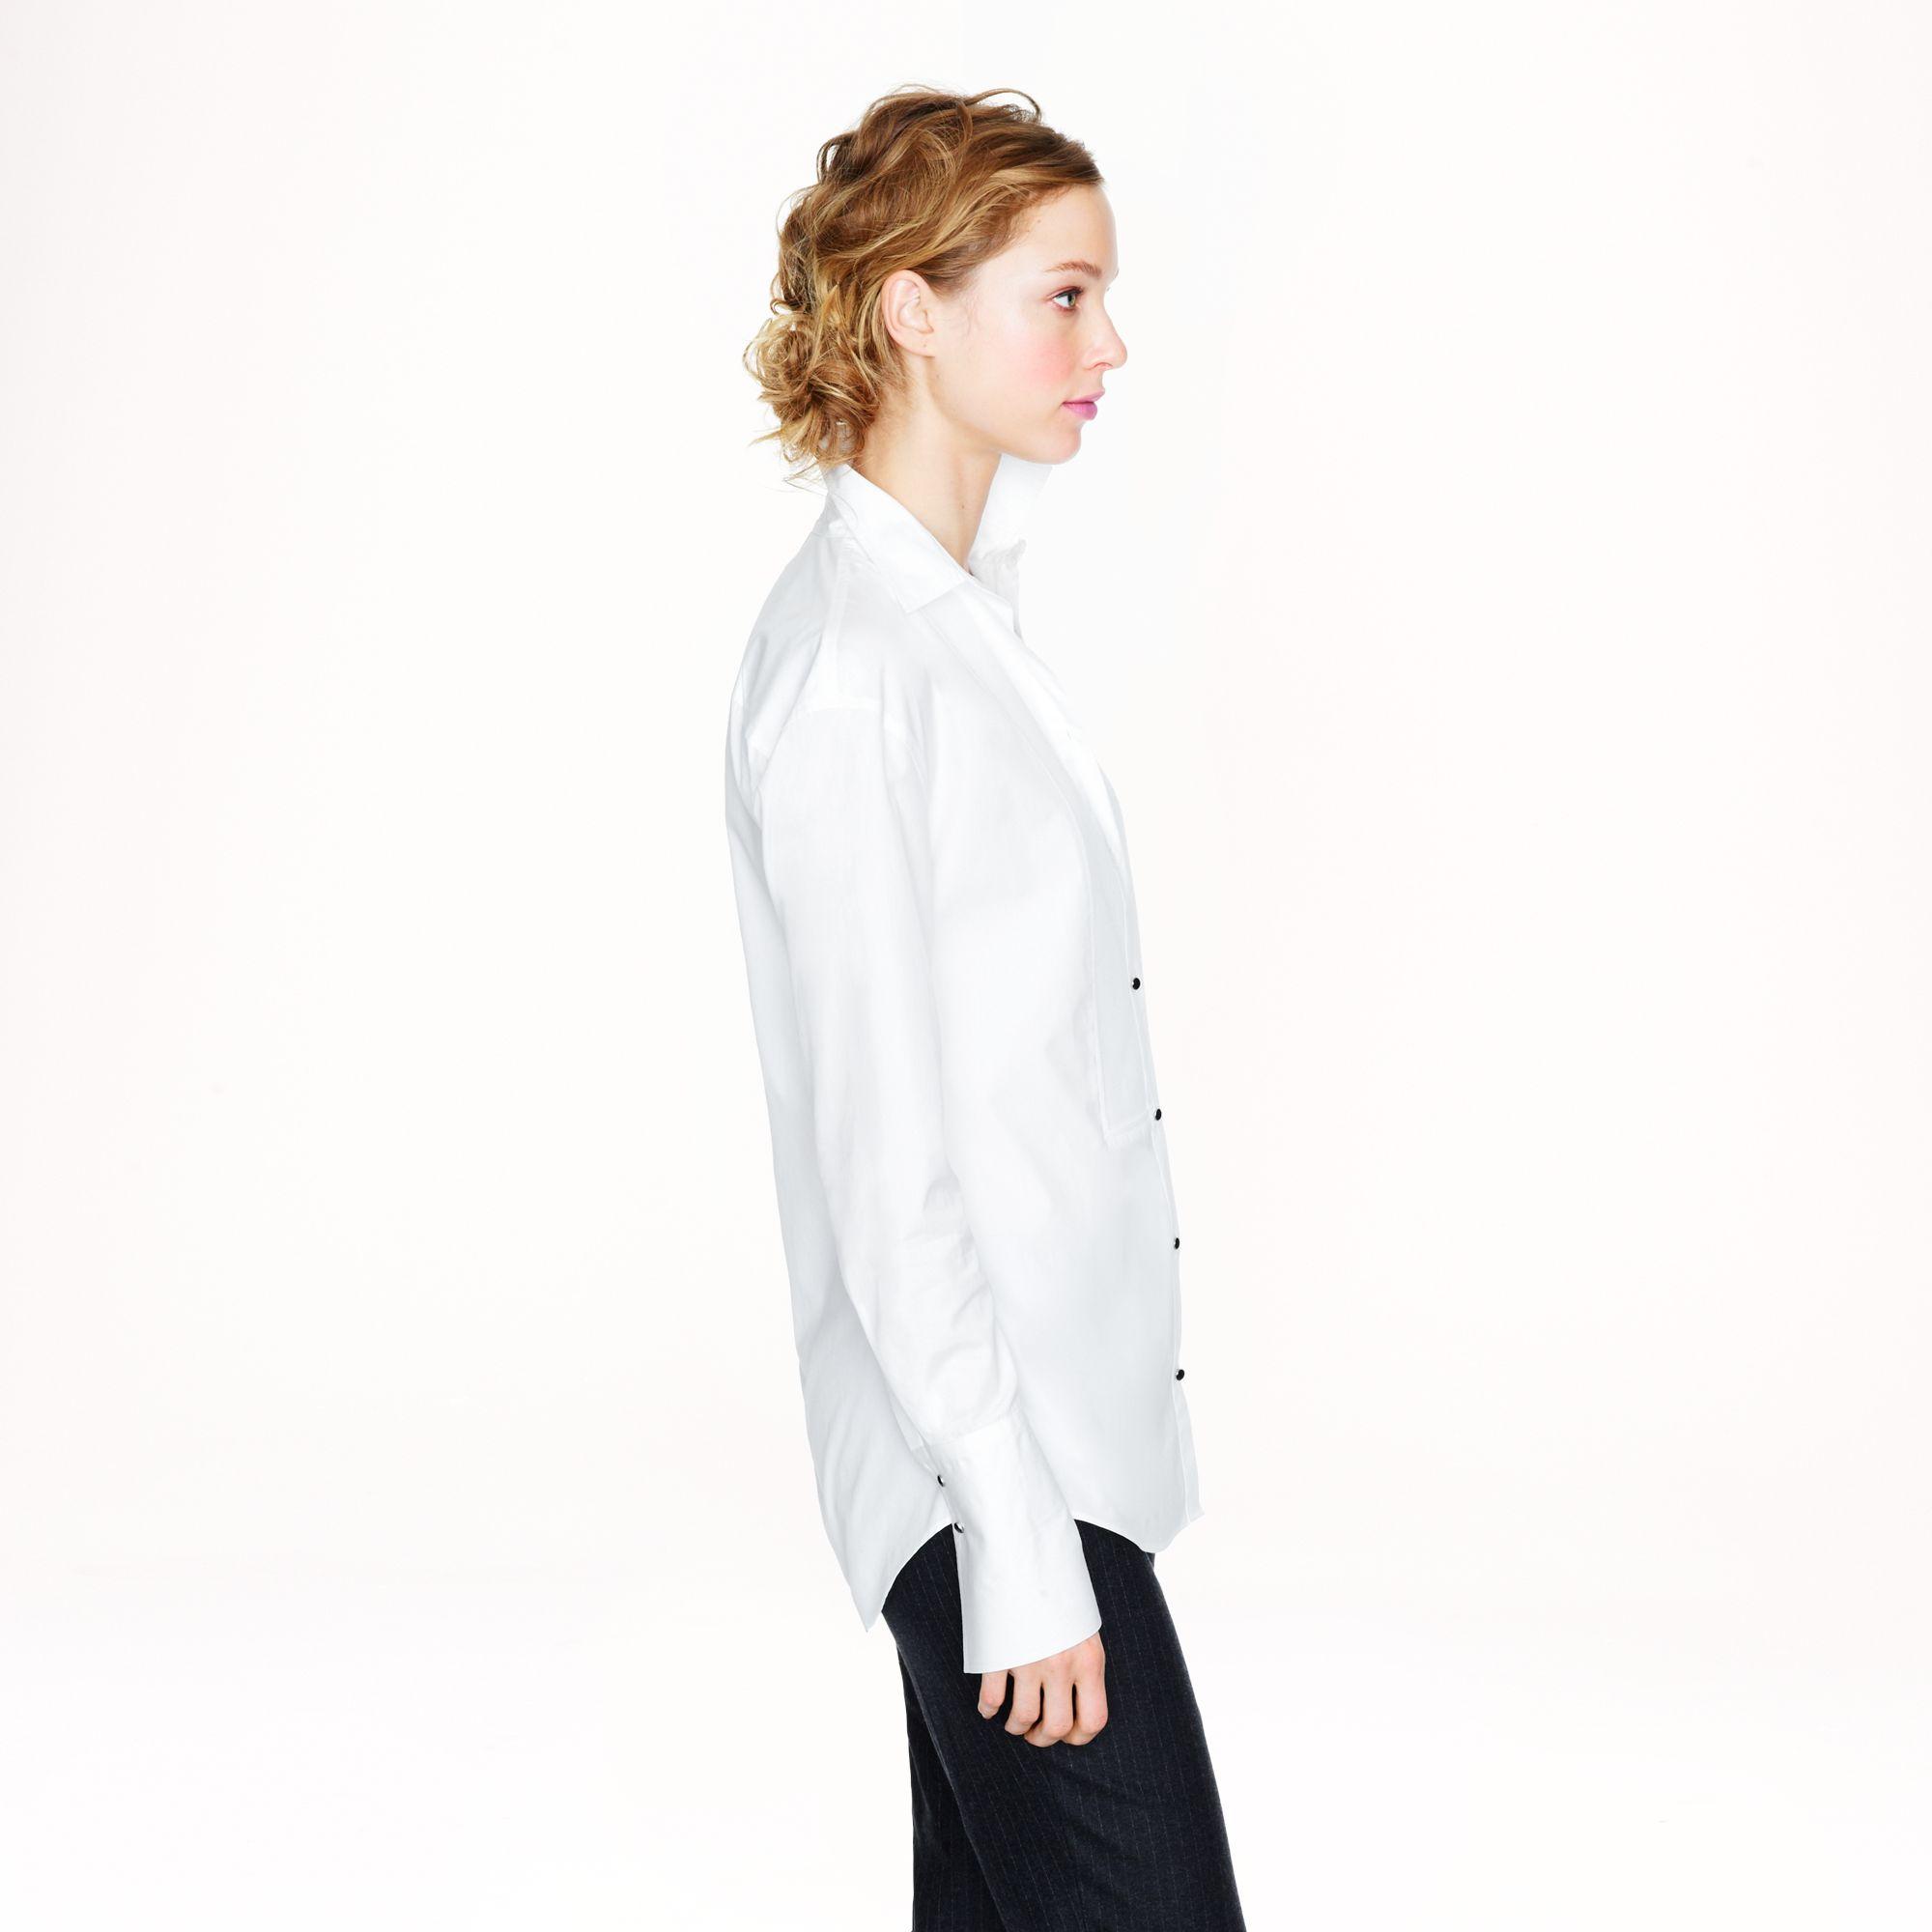 Lyst - J.Crew Thomas Mason For Long Tuxedo Shirt in White 61426ec5d